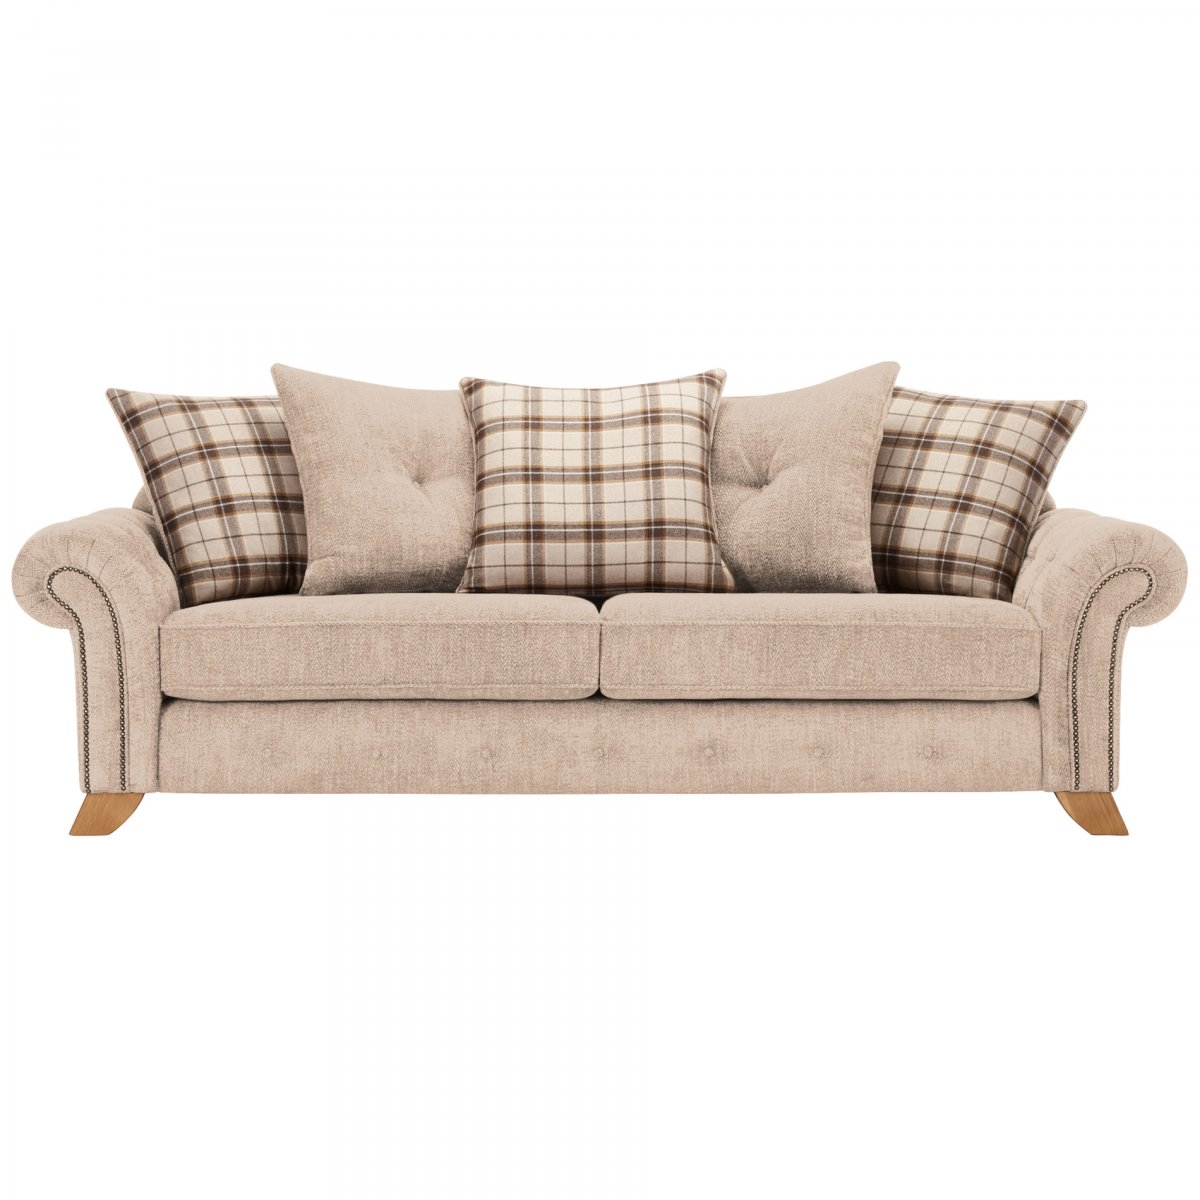 Montana 4 Seater Pillow Back Sofa in Beige  Tartan Cushions